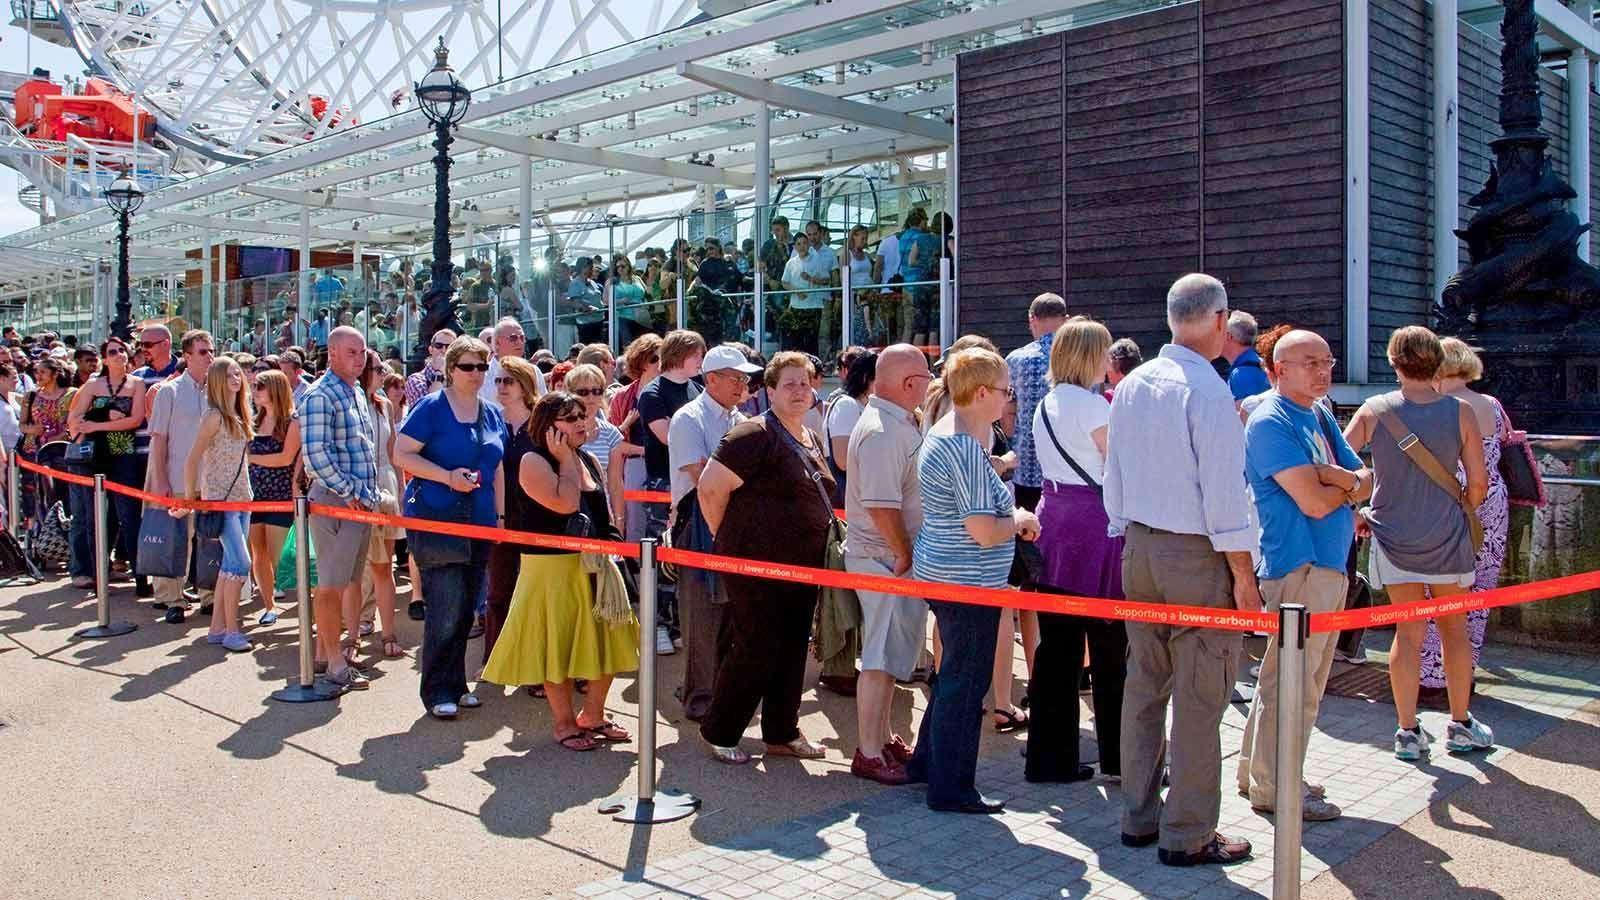 London Eye Tourists Queuing - Mace Group